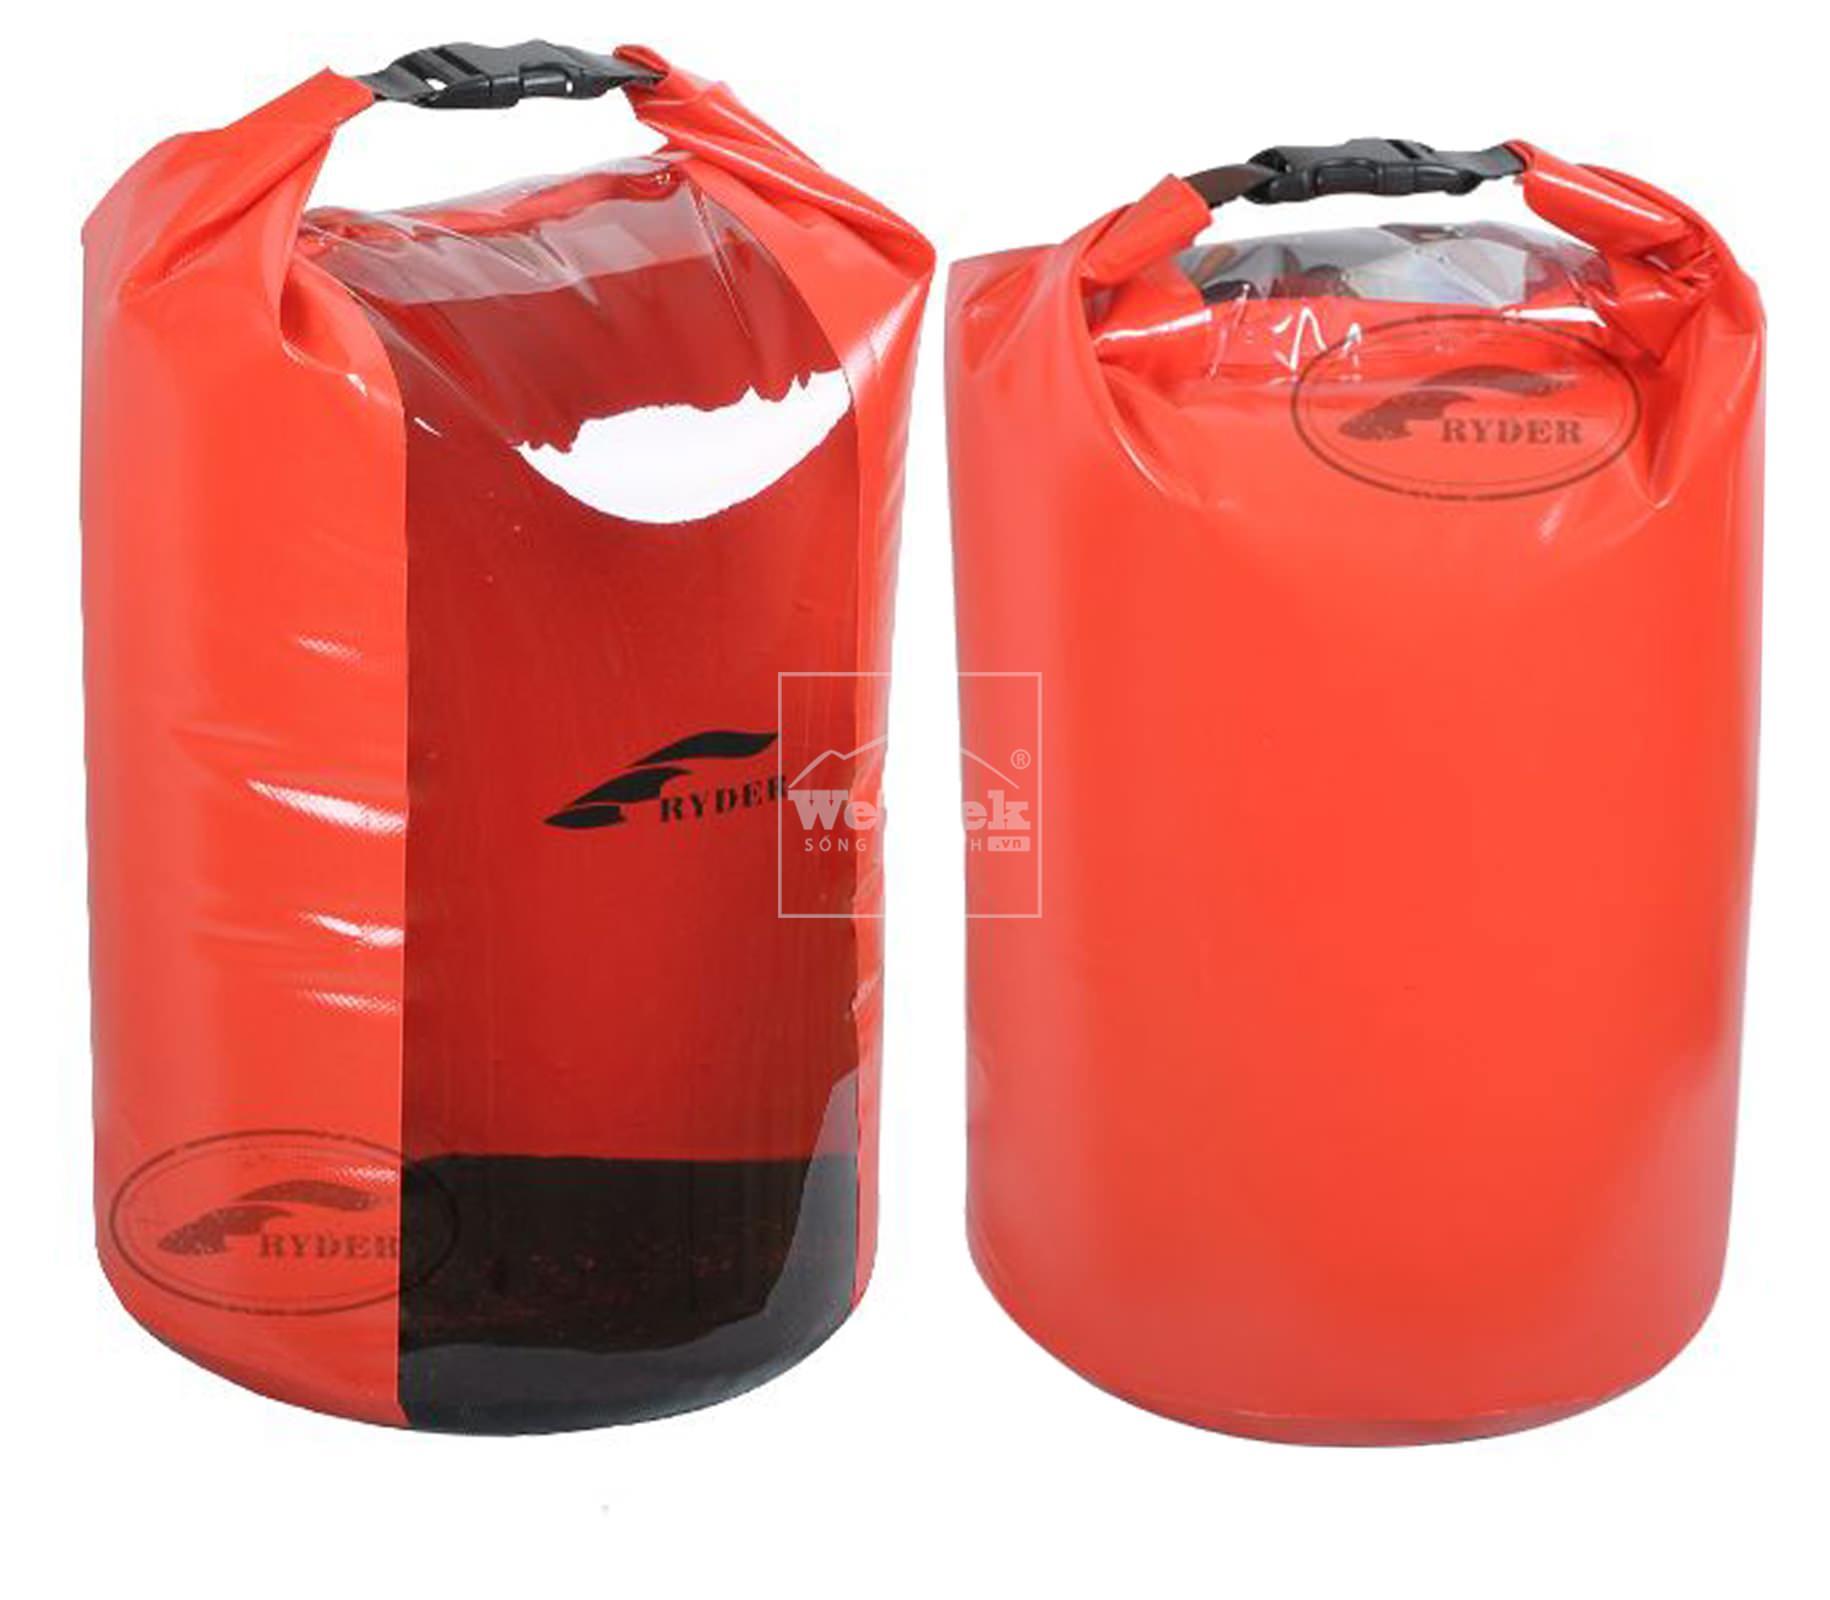 tui-kho-chong-nuoc-5l-ryder-clear-pvc-panel-c1011-1227-wetrek.vn